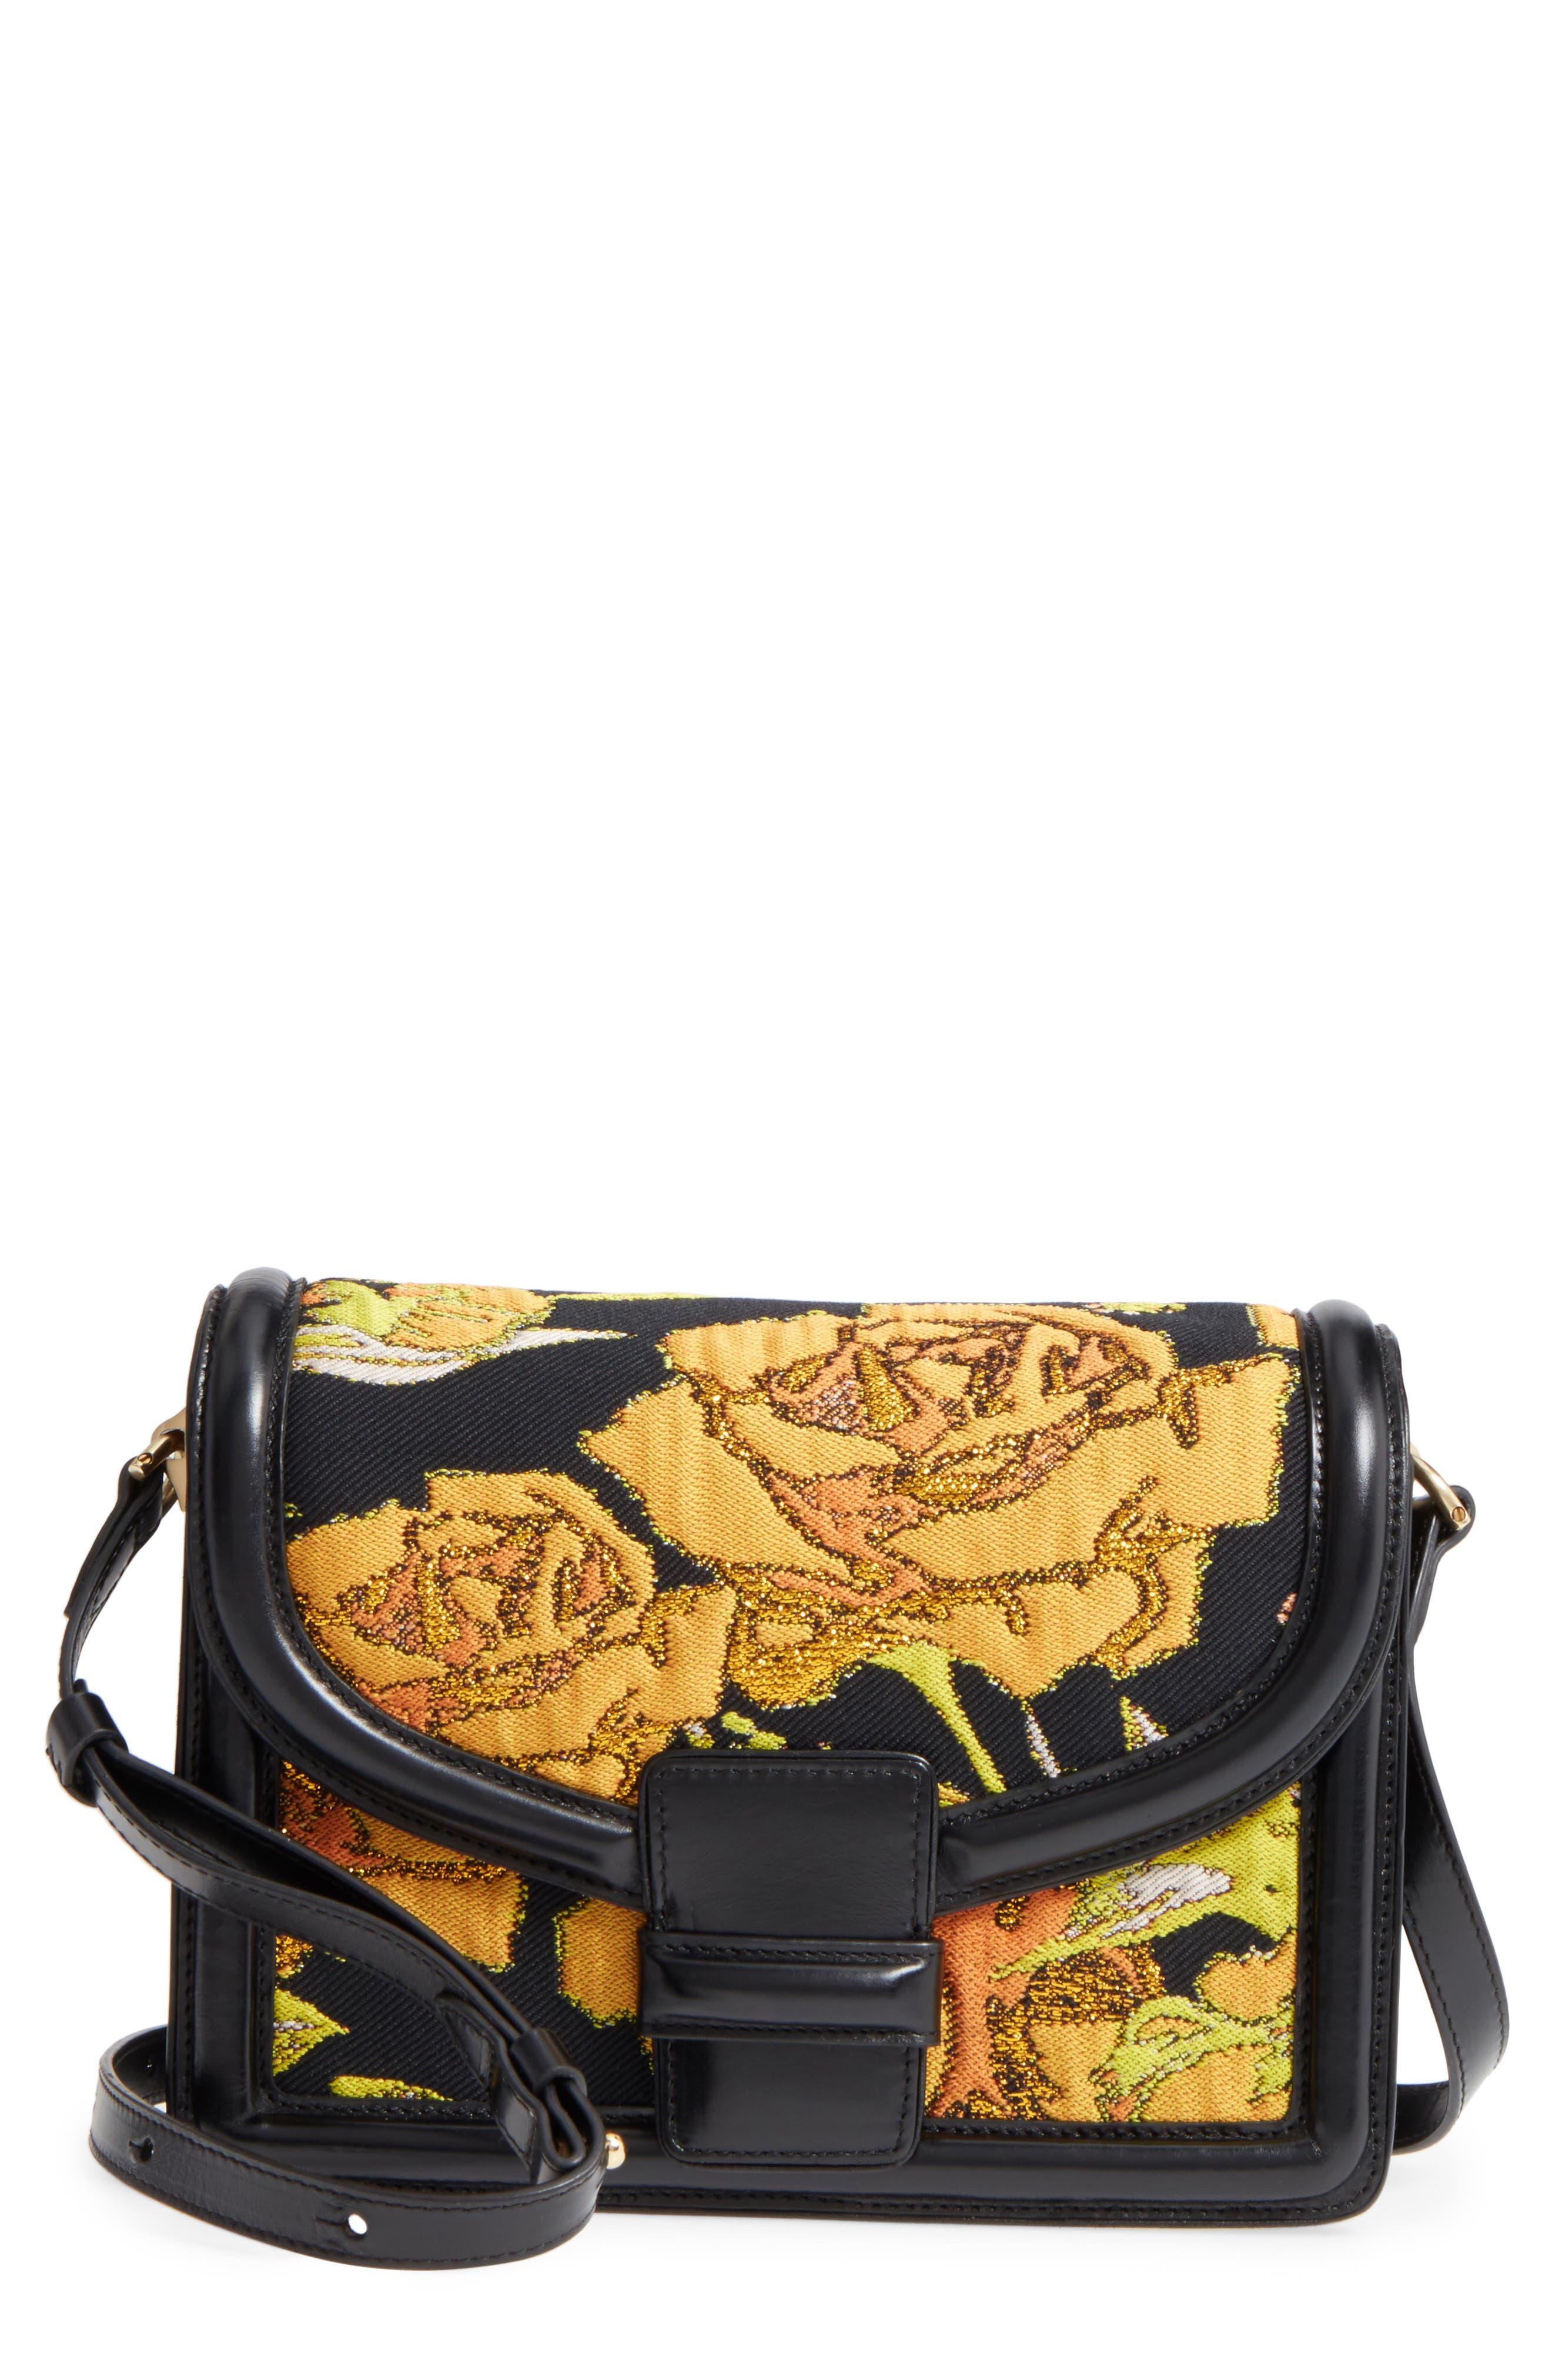 Floral Jacquard & Leather Crossbody Bag,                             Main thumbnail 1, color,                             Yellow